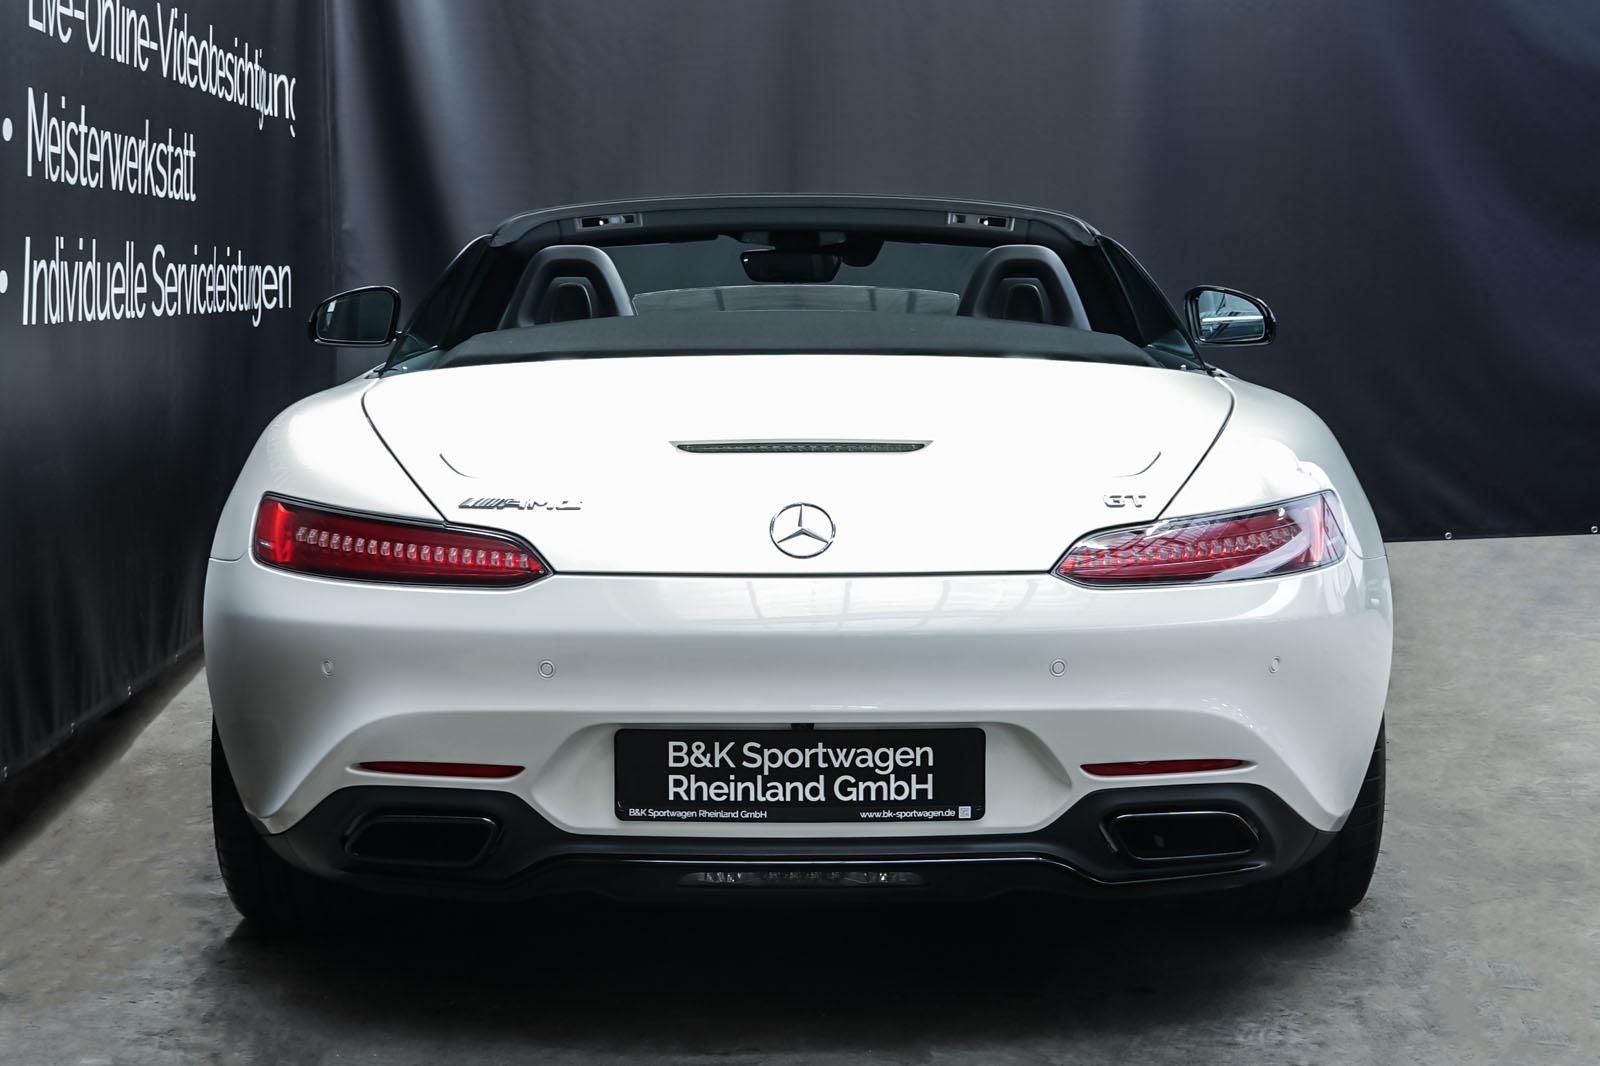 11Mercedes_Benz_AMG_GT_Roadster_Weiss_Schwarz_MB-9710_19_w